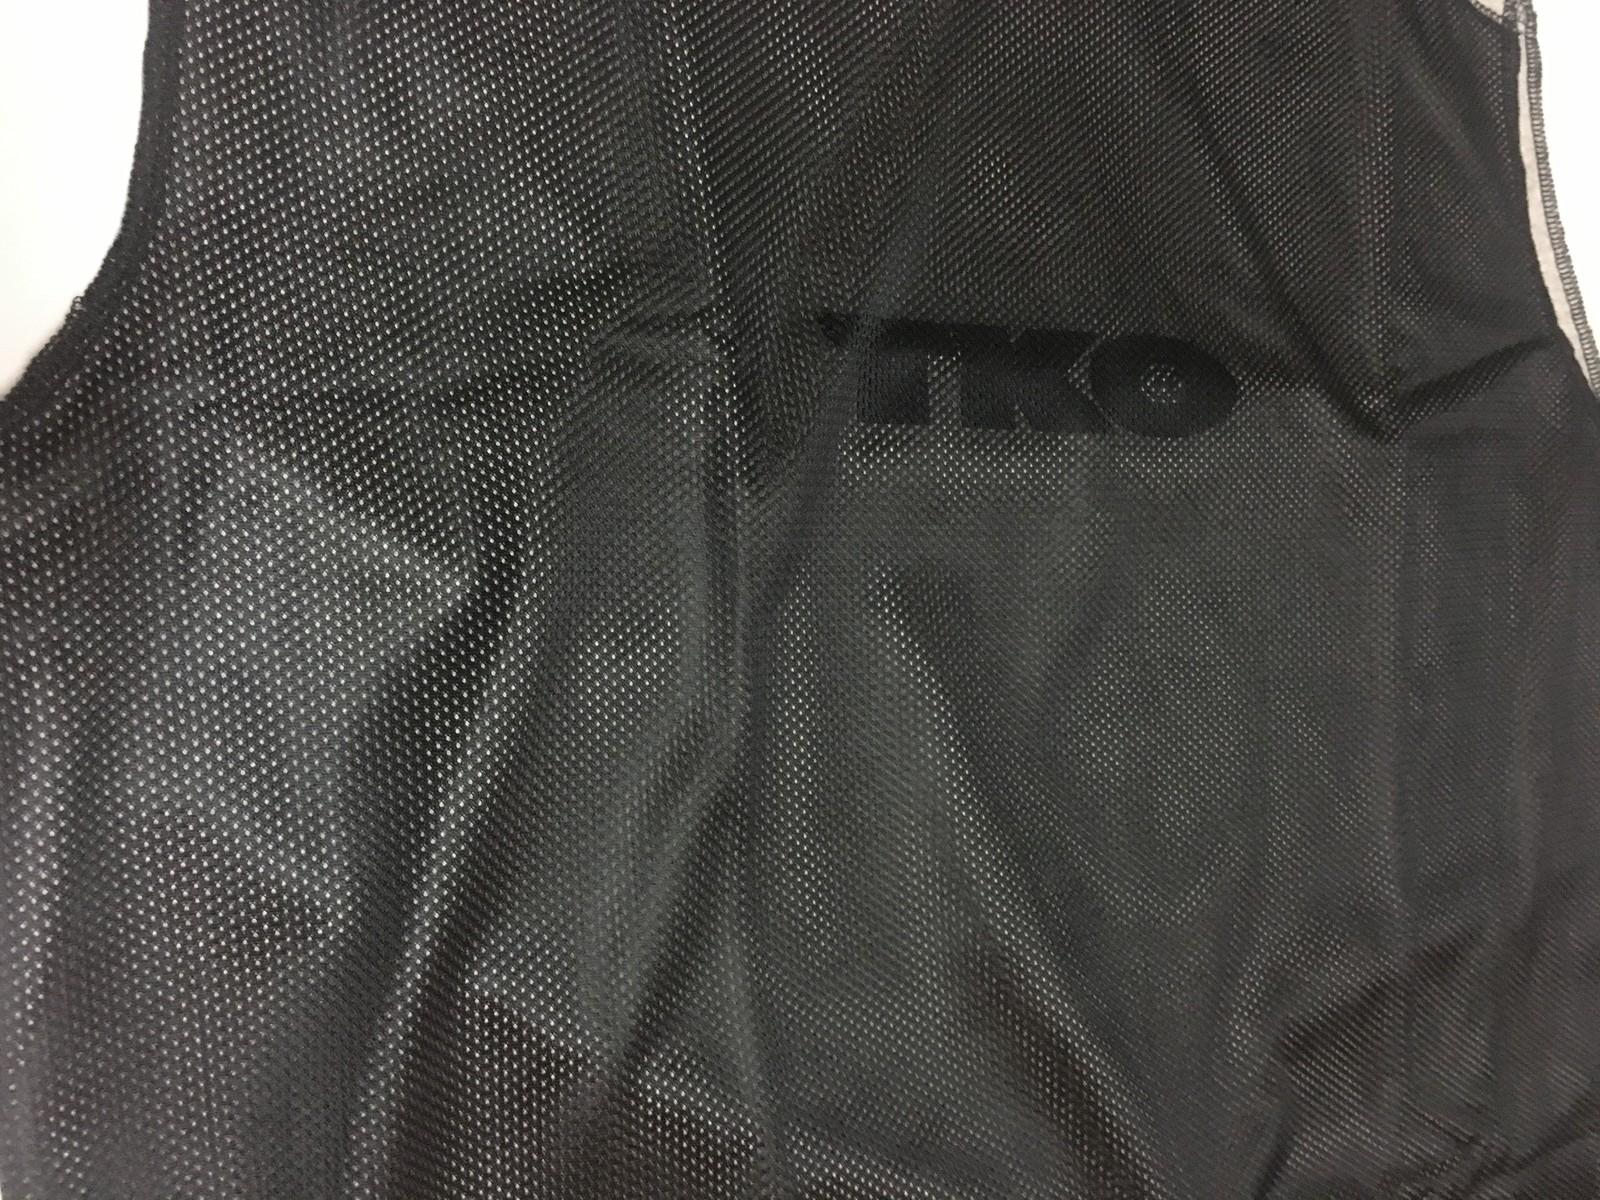 TKO Men's Performance Wear Shirt XL Black & Gray Poly Mesh